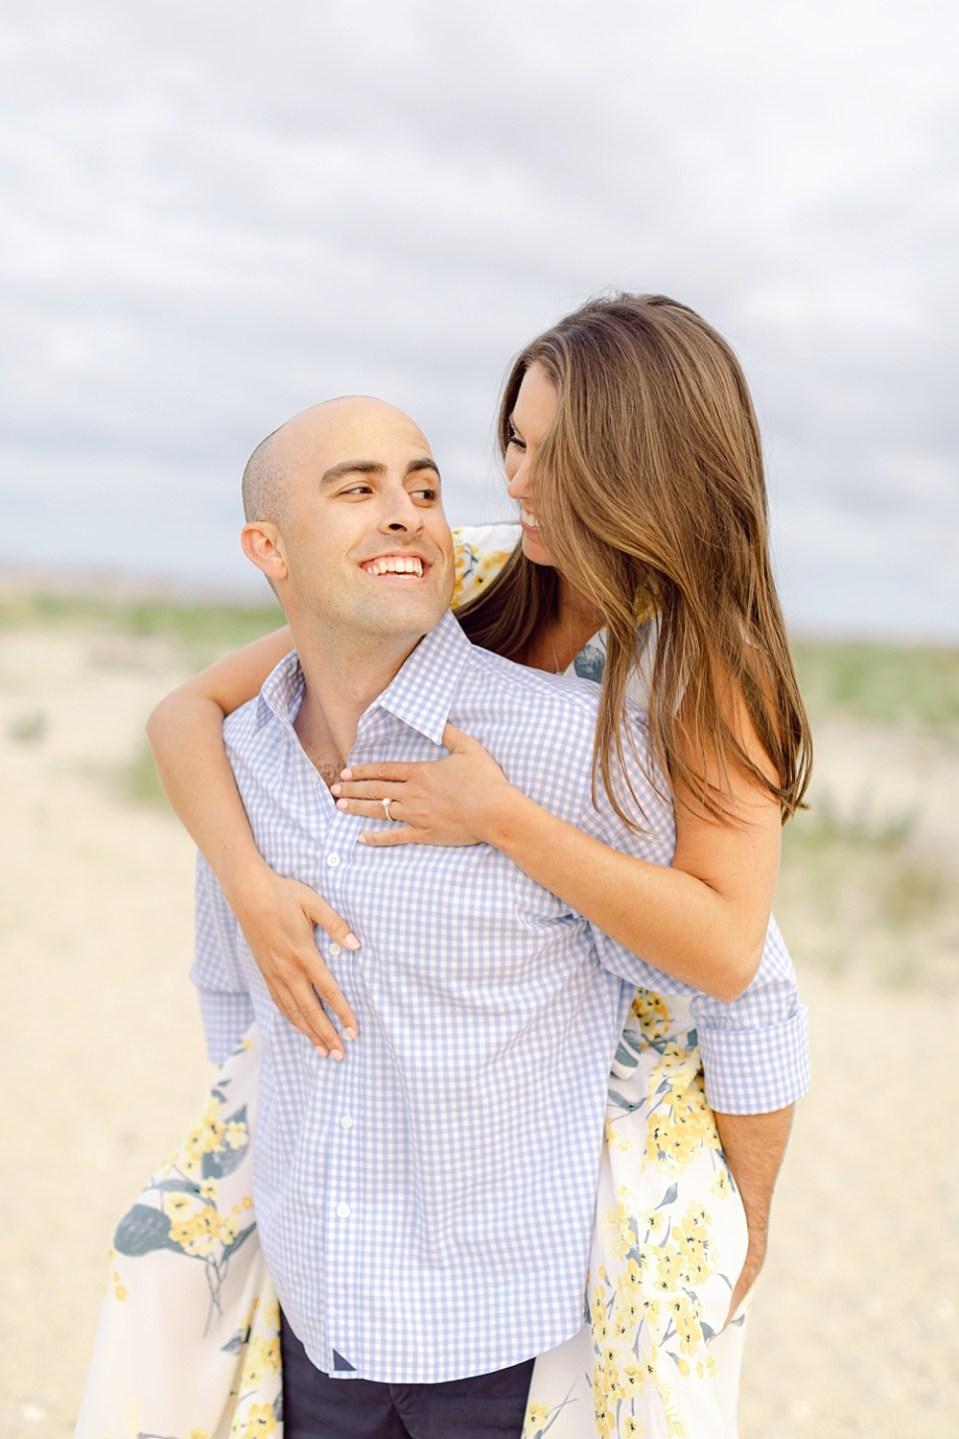 barnegat lighthouse engagement photos | new jersey wedding photographer sarah canning